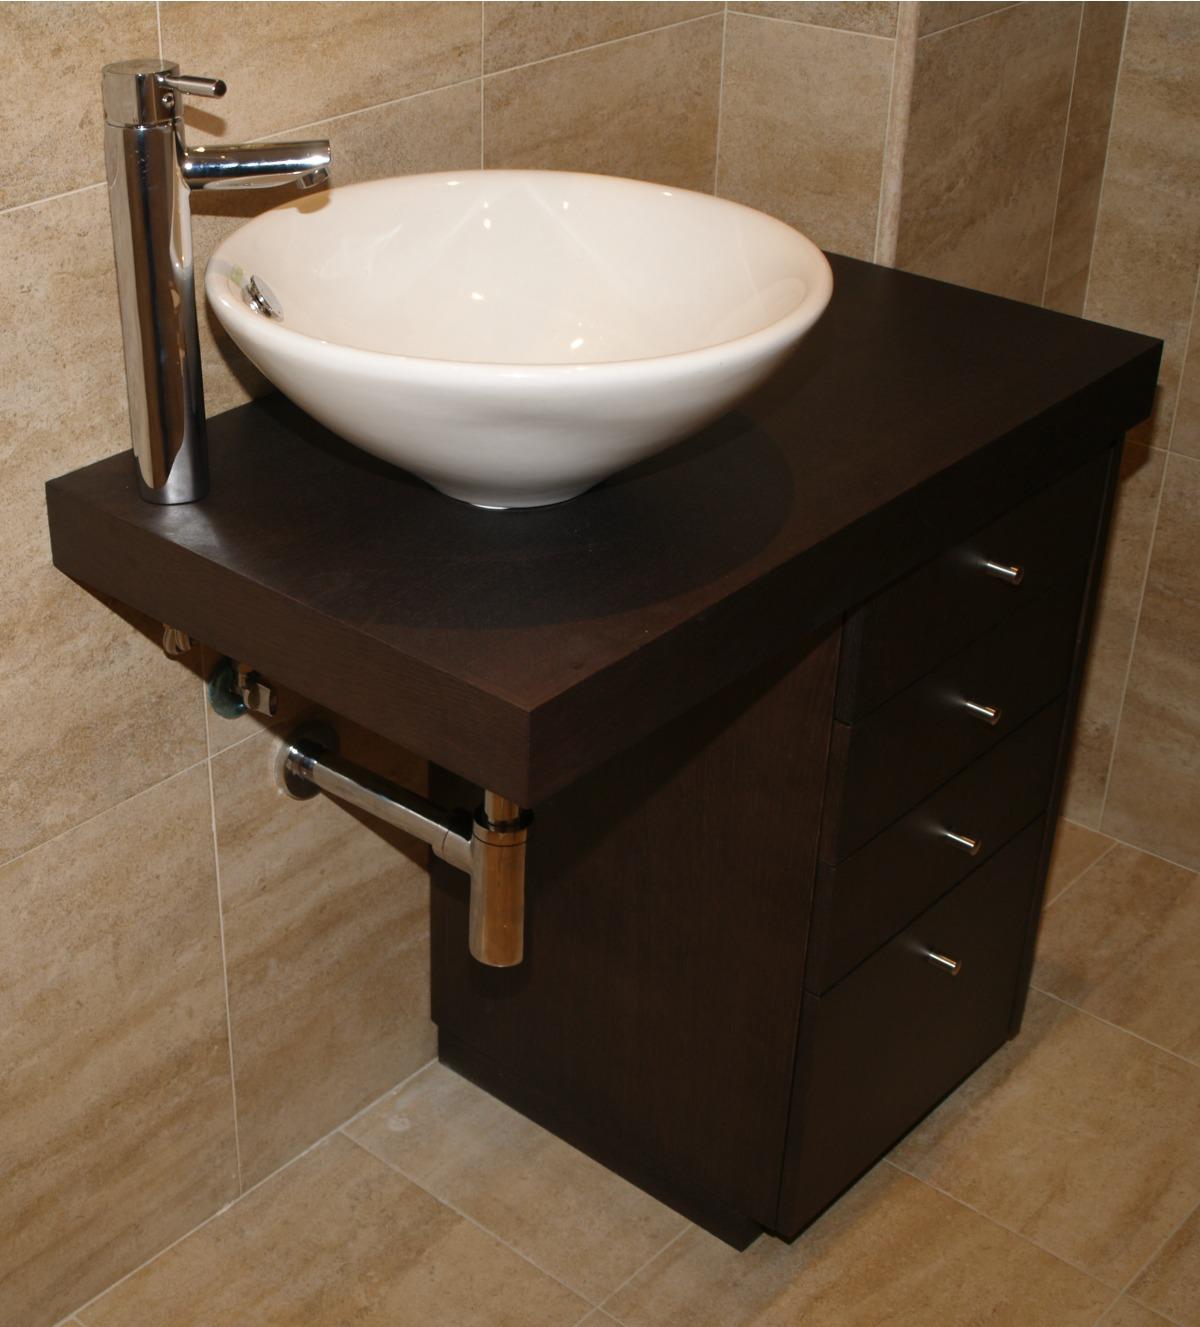 Muebles de madera para ba o h baco f brica puertas de for Fabricas de muebles en lucena cordoba